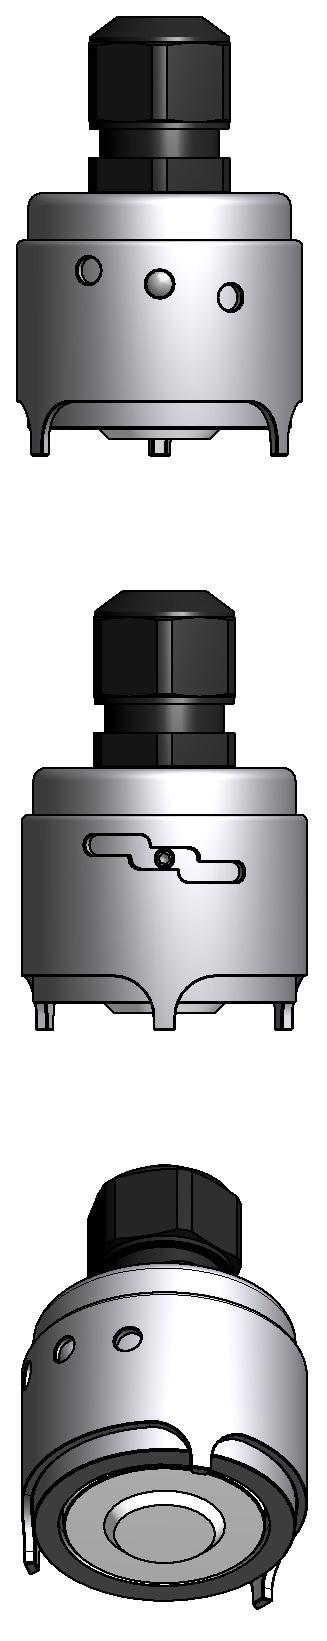 Leckage-Sensor flach Aquasant